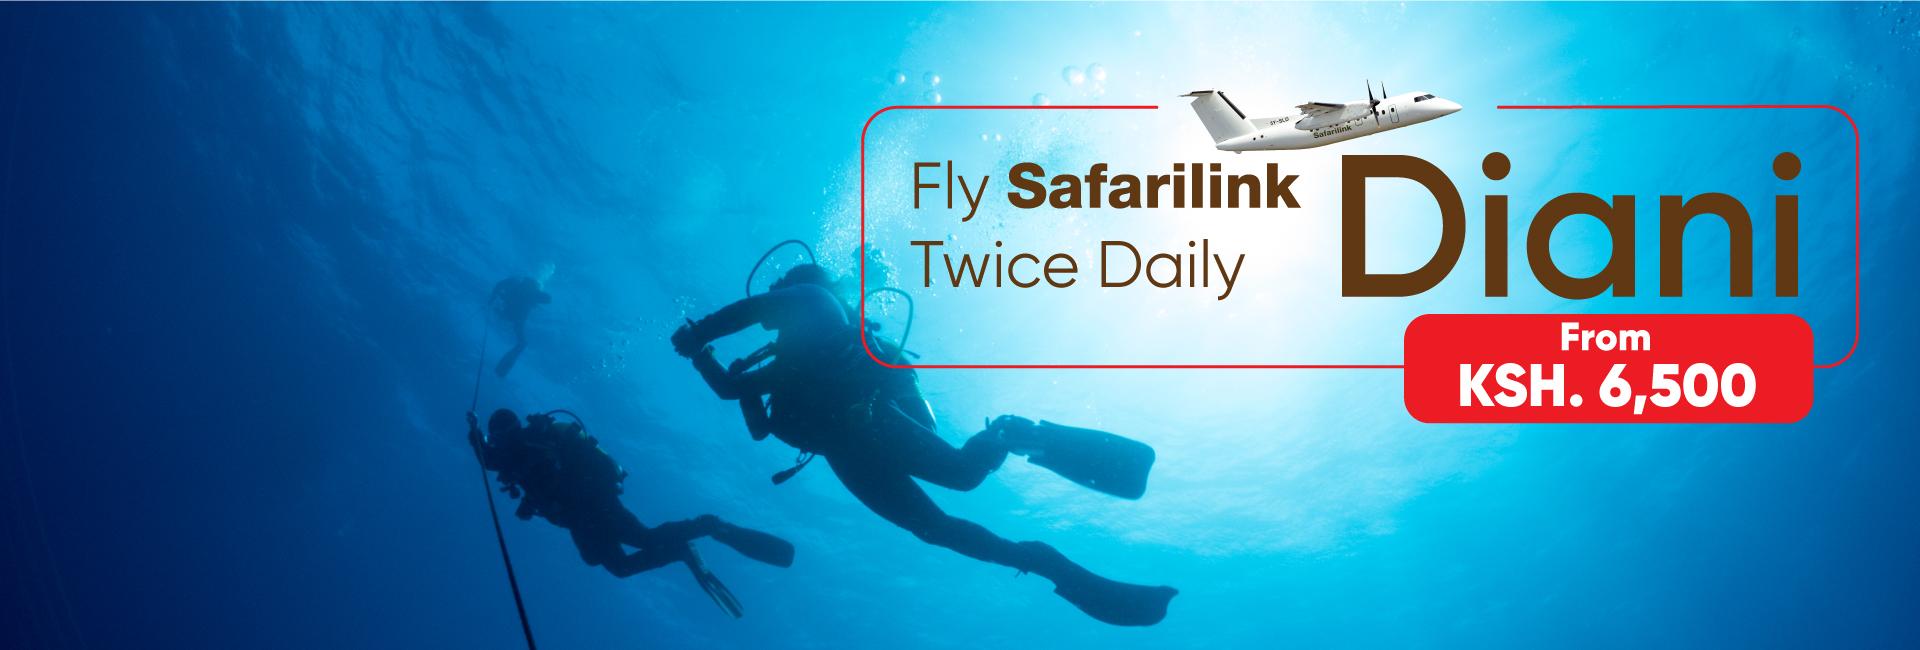 Safarilink safety measures